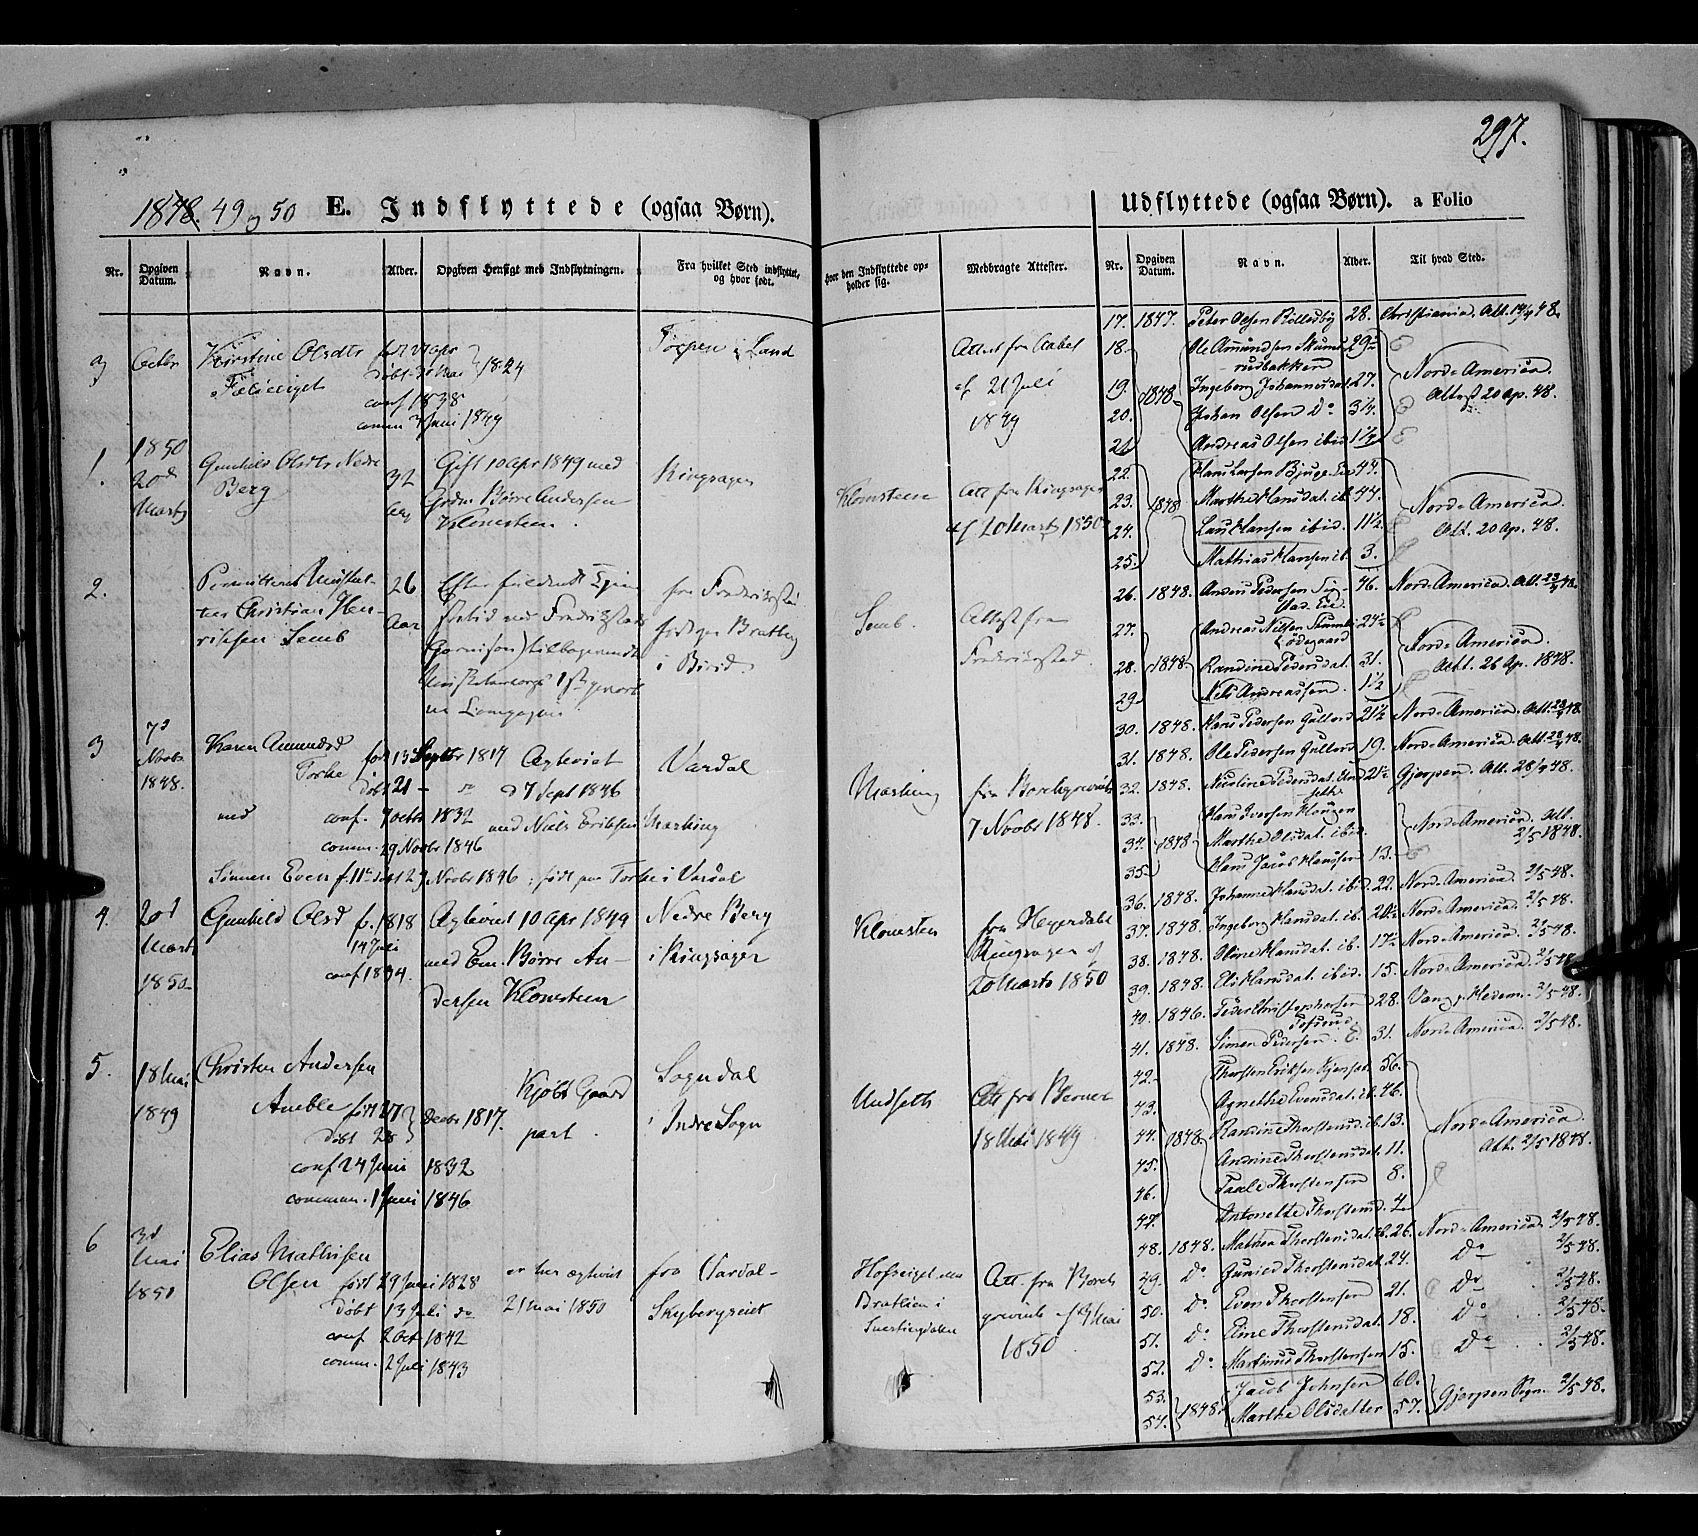 SAH, Biri prestekontor, Ministerialbok nr. 5, 1843-1854, s. 297